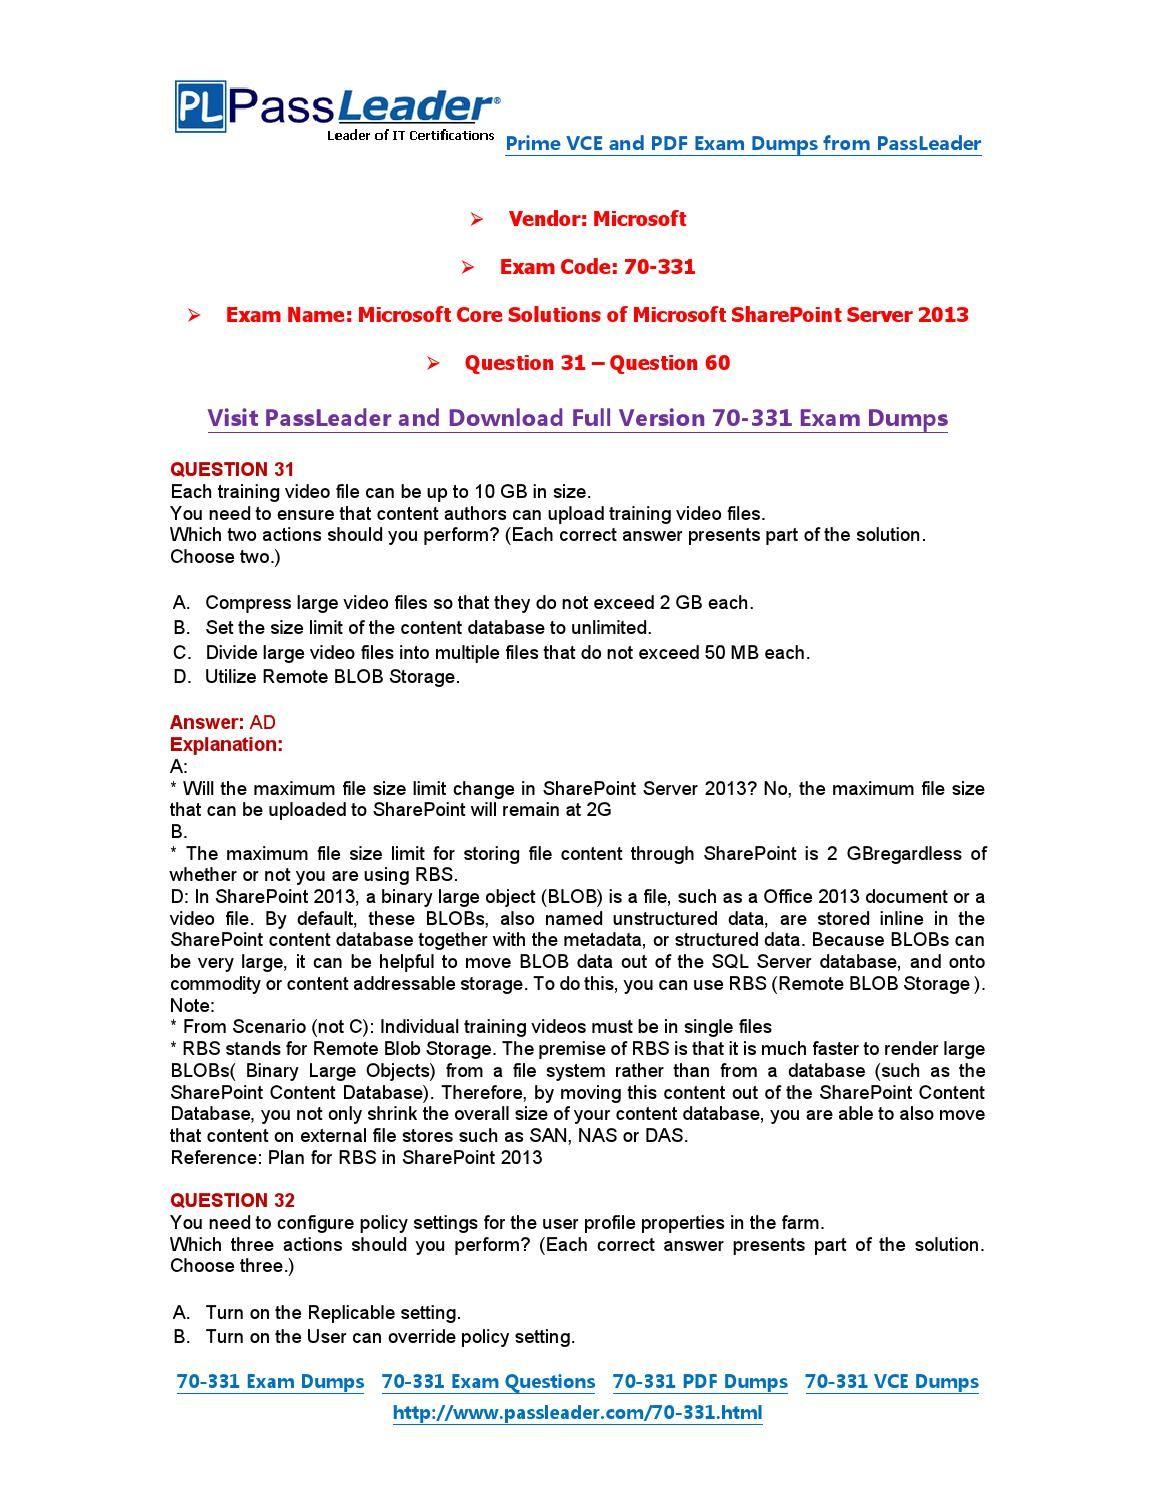 70 331 exam dumps with pdf and vce download 31 60 70 331 exam 70 331 exam dumps with pdf and vce download 31 60 xflitez Image collections